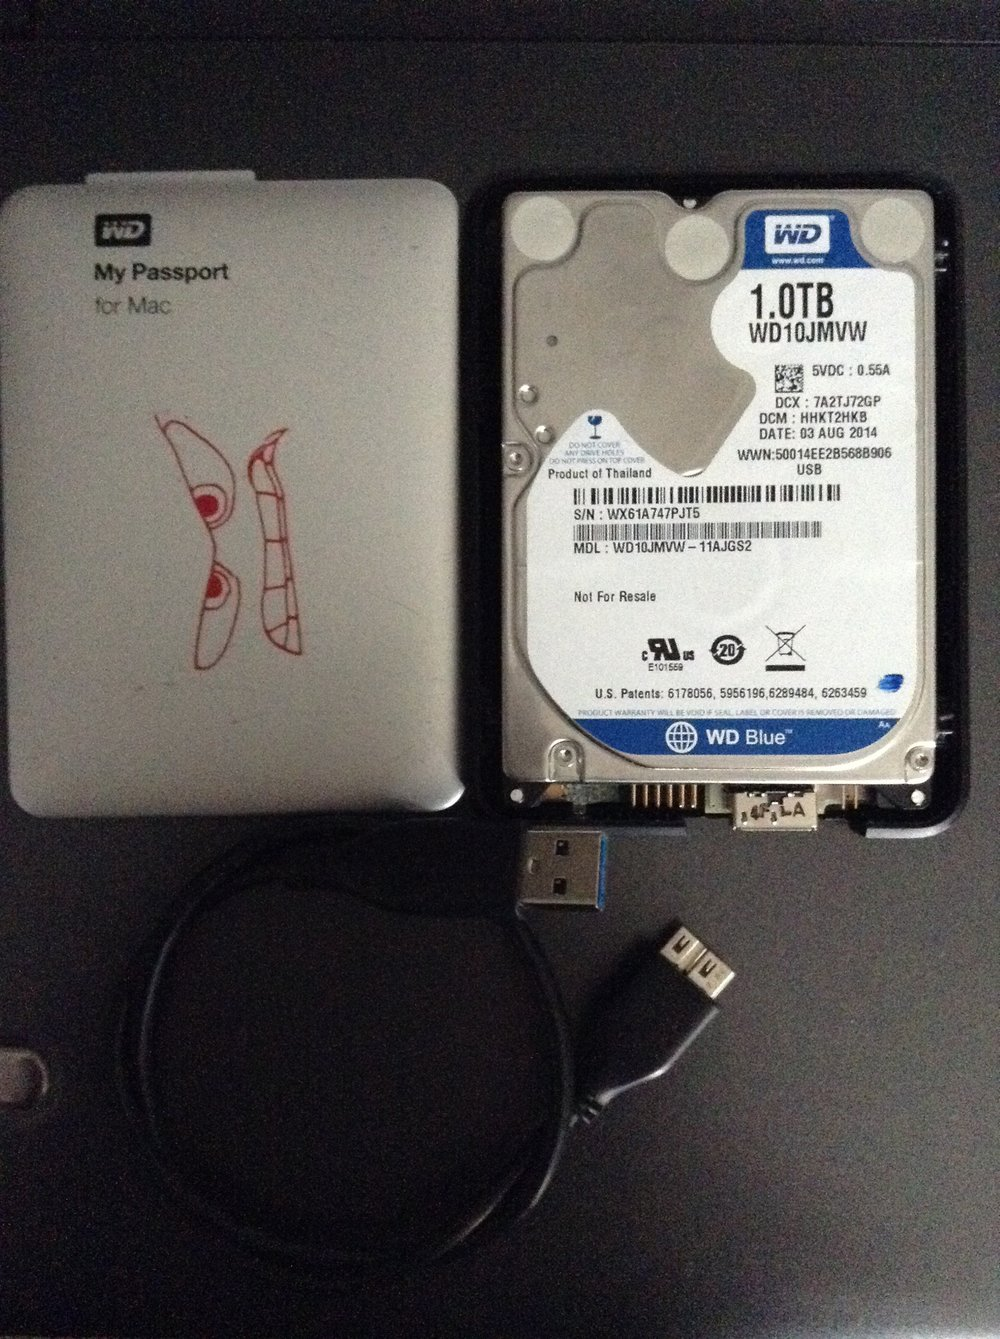 WD My Passport USB External Drive.jpeg